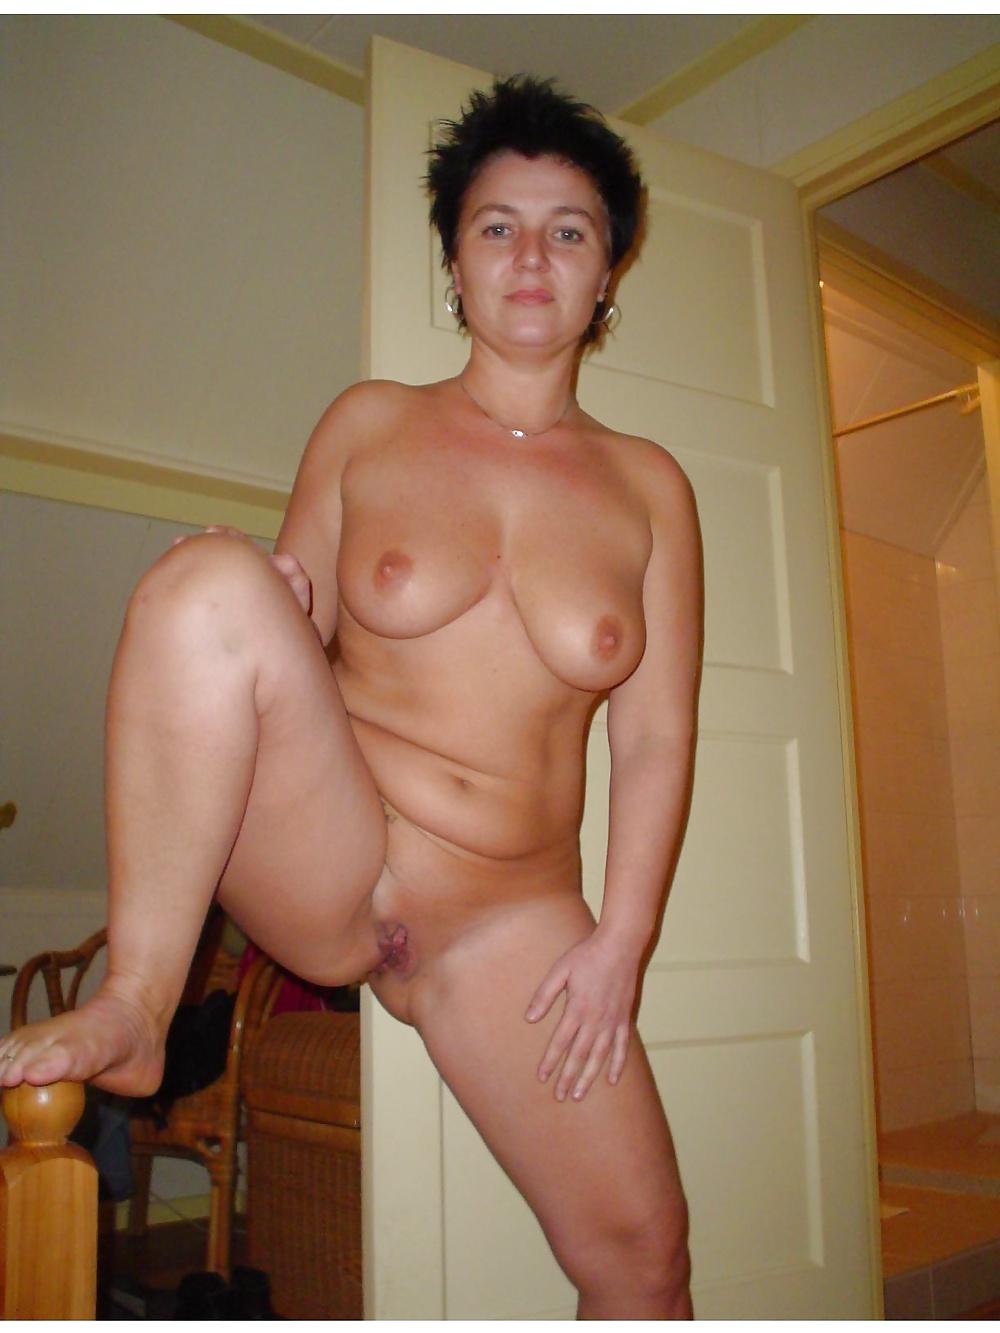 Sexy Mature Milf Babs - 30 Pics - Xhamstercom-8892